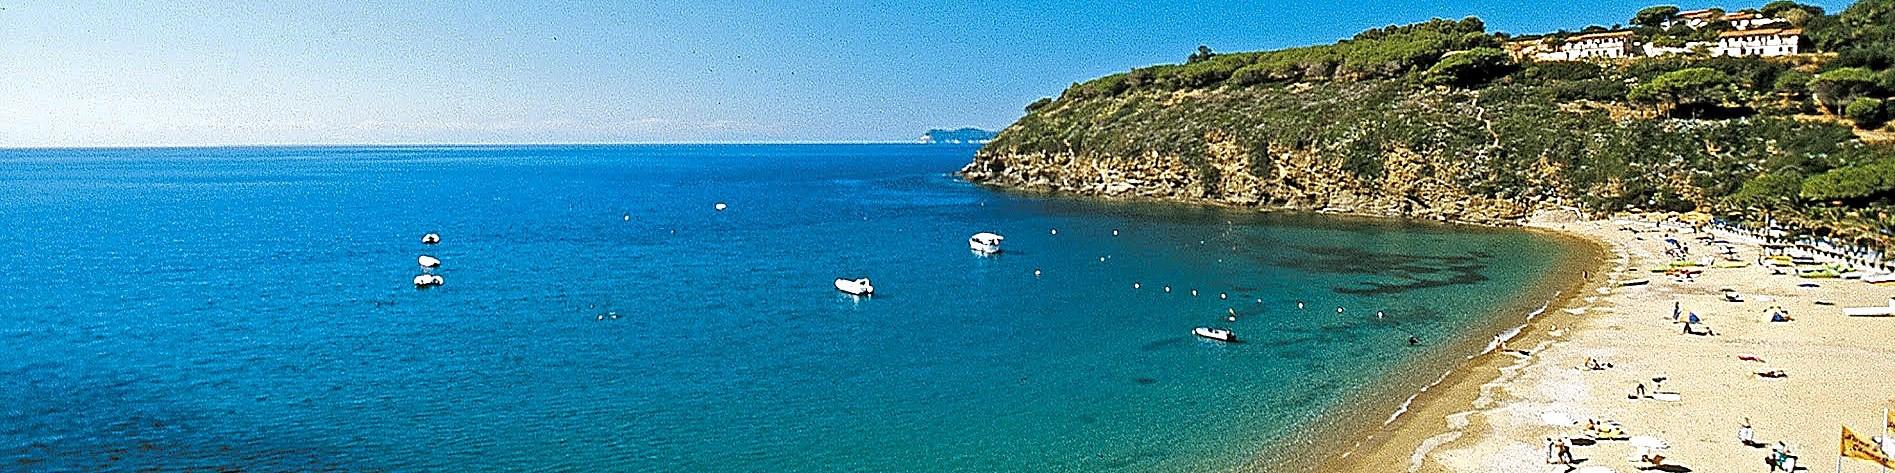 Capoliveri, pláž Morcone